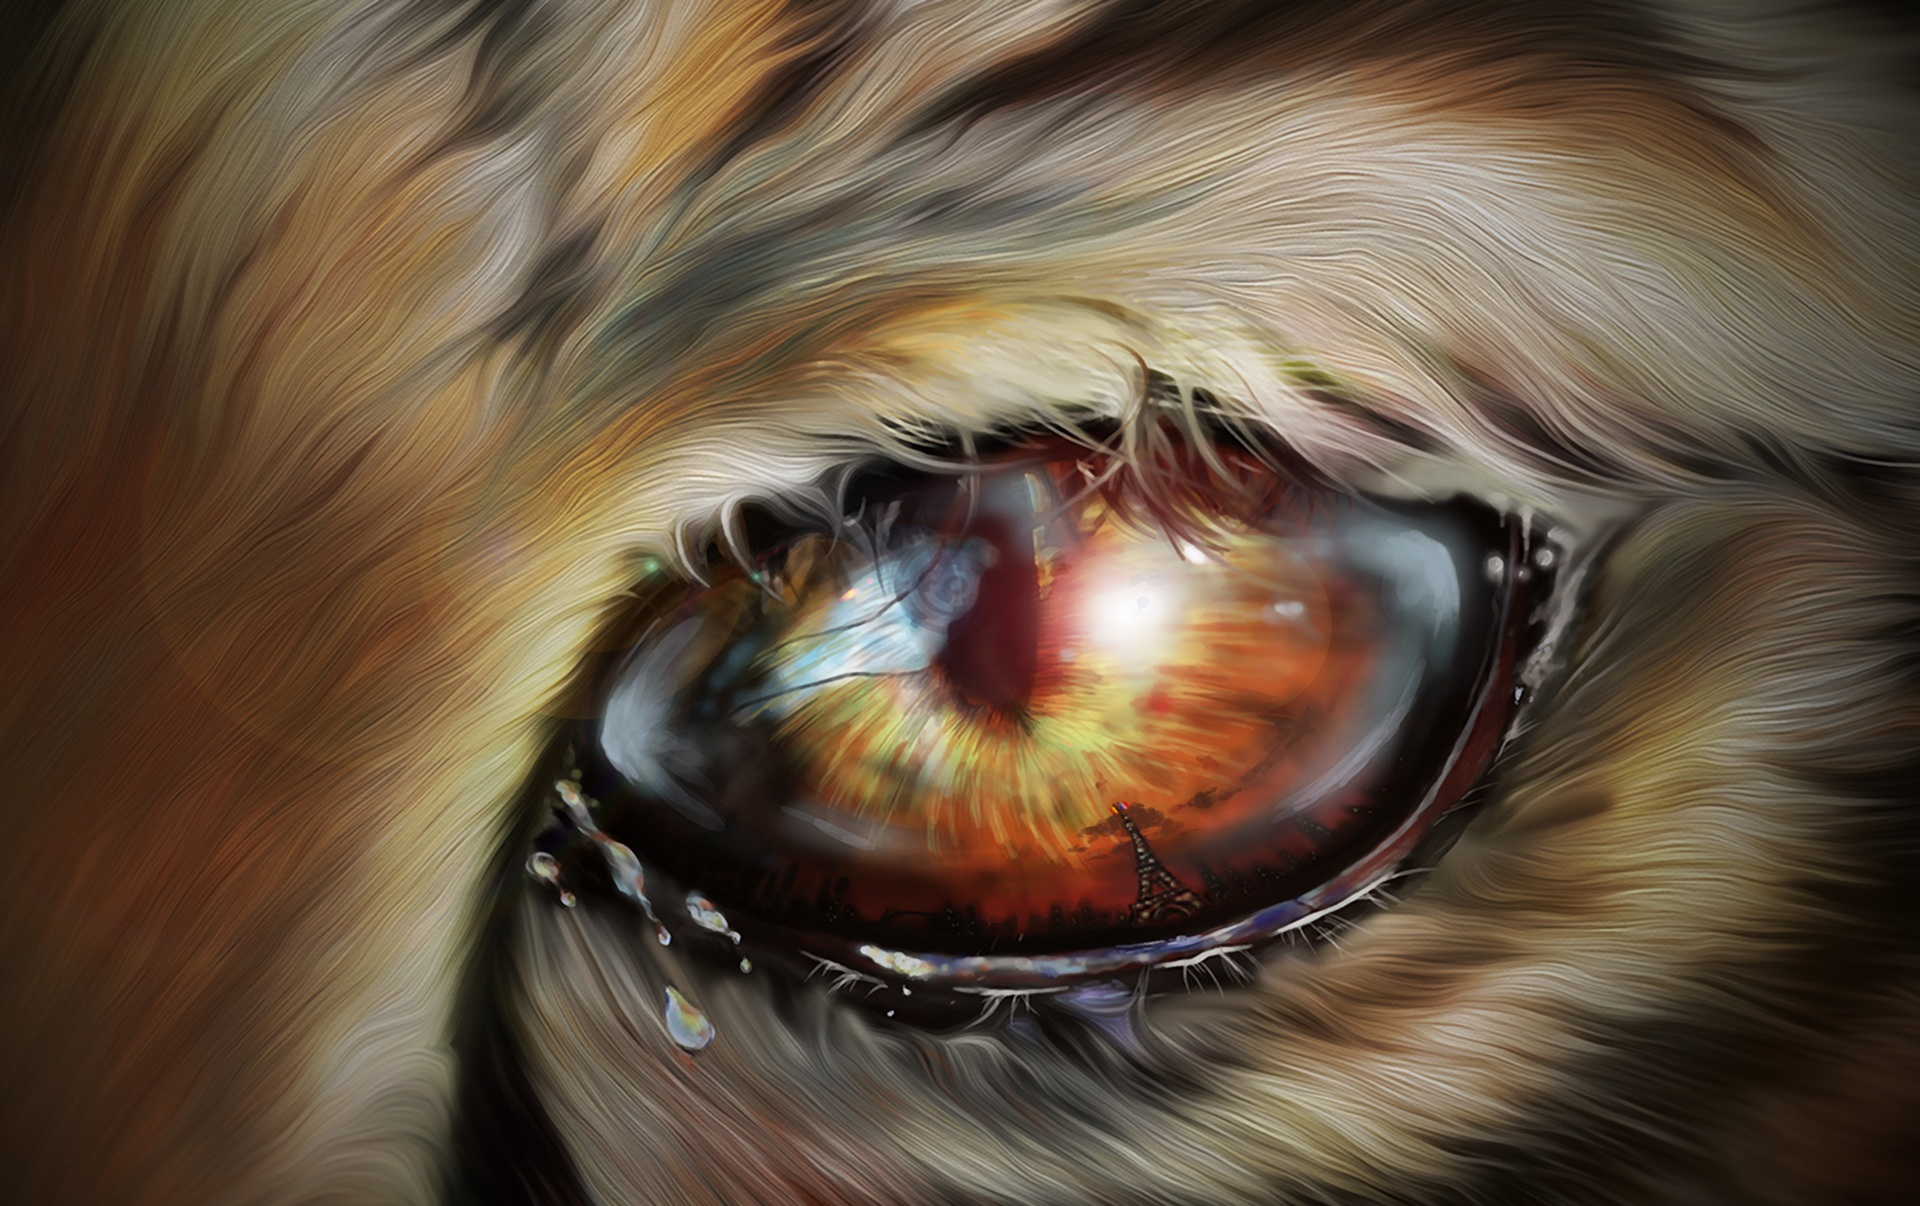 helm tigers eye repeat - HD1920×1206